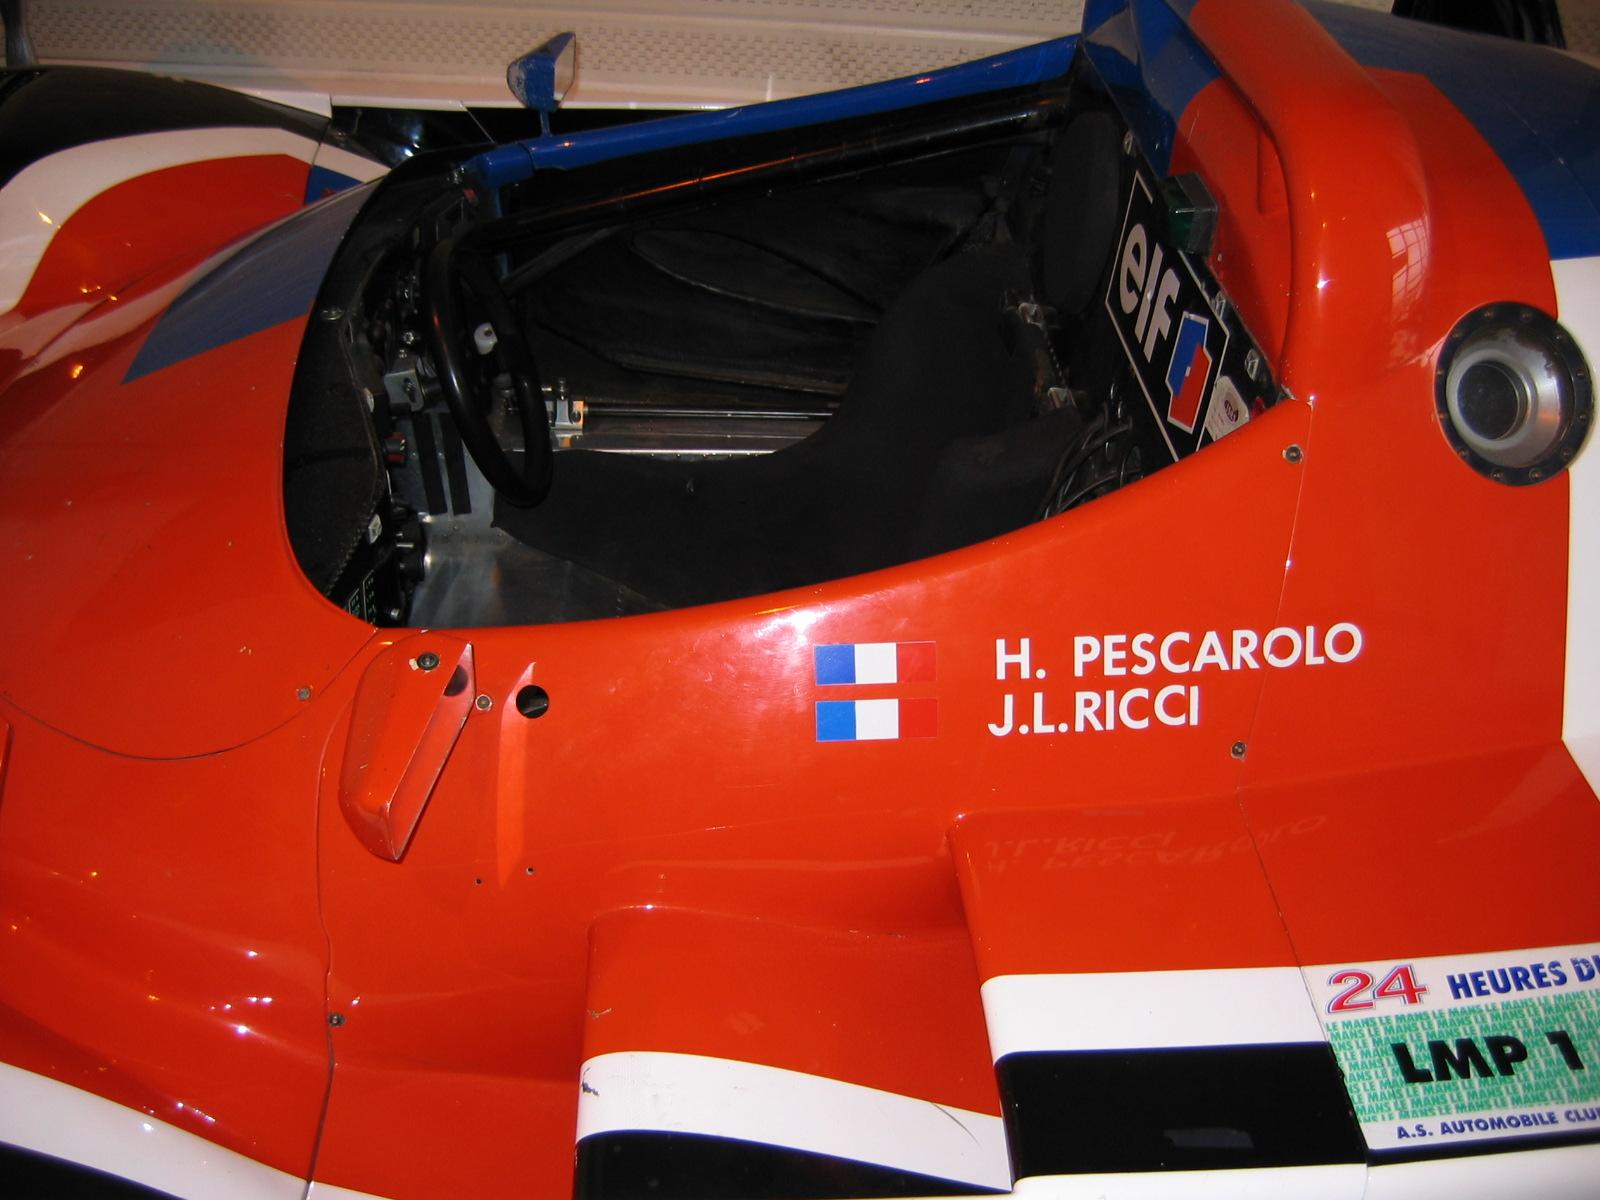 Le Mans- Legende Henri Pescarolo, als Fahrer: 33 Rennen, 4 Geamtsiege, 2 Klassensiege, als Team-Eigner 2. hinter Audi 2005